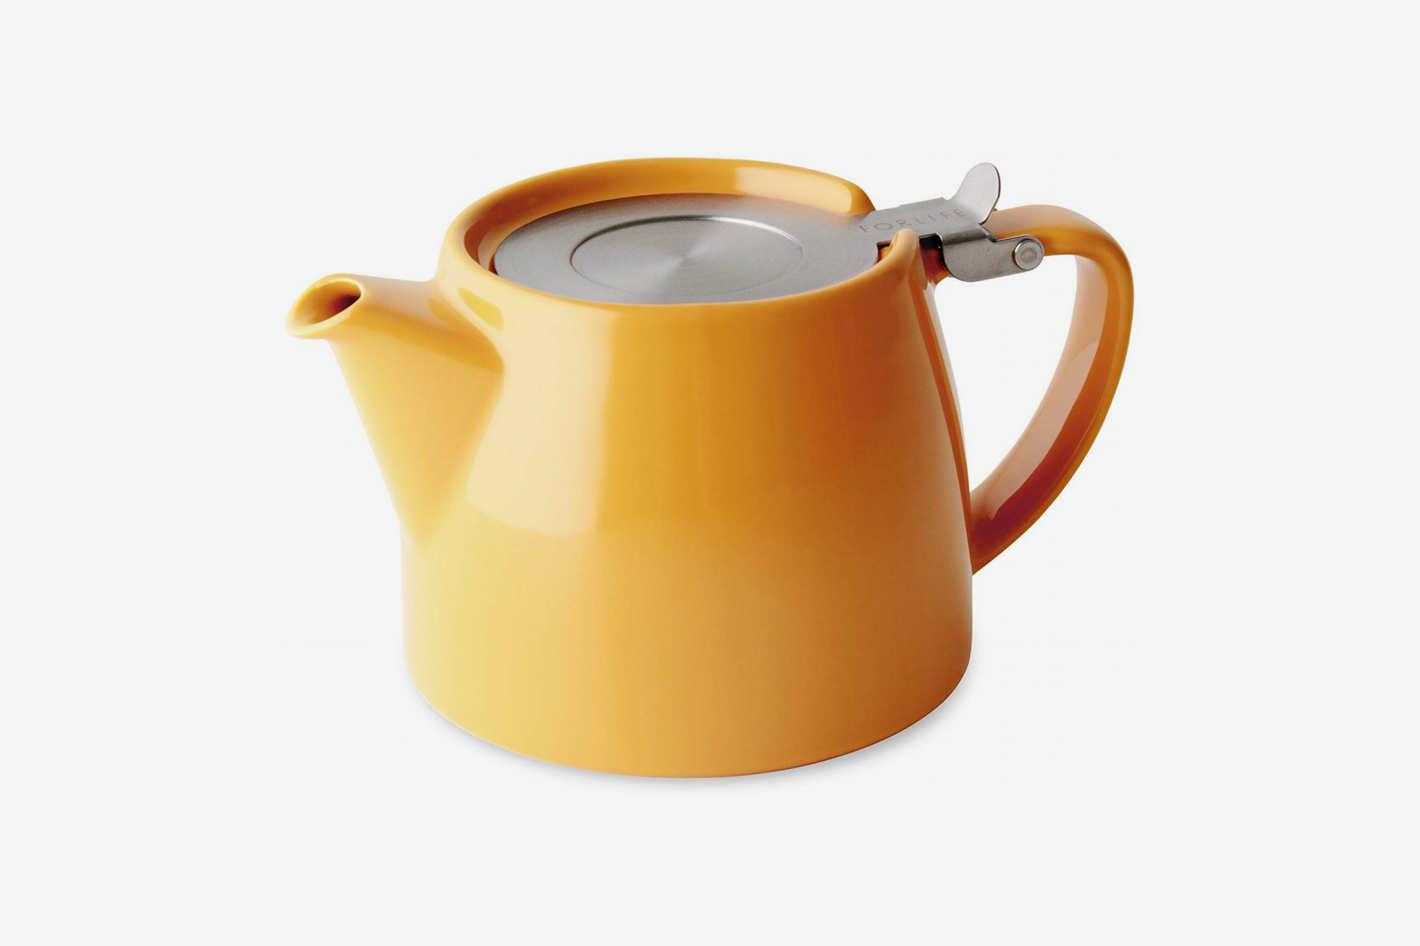 FORLIFE Stump Teapot, 18oz, Mandarin